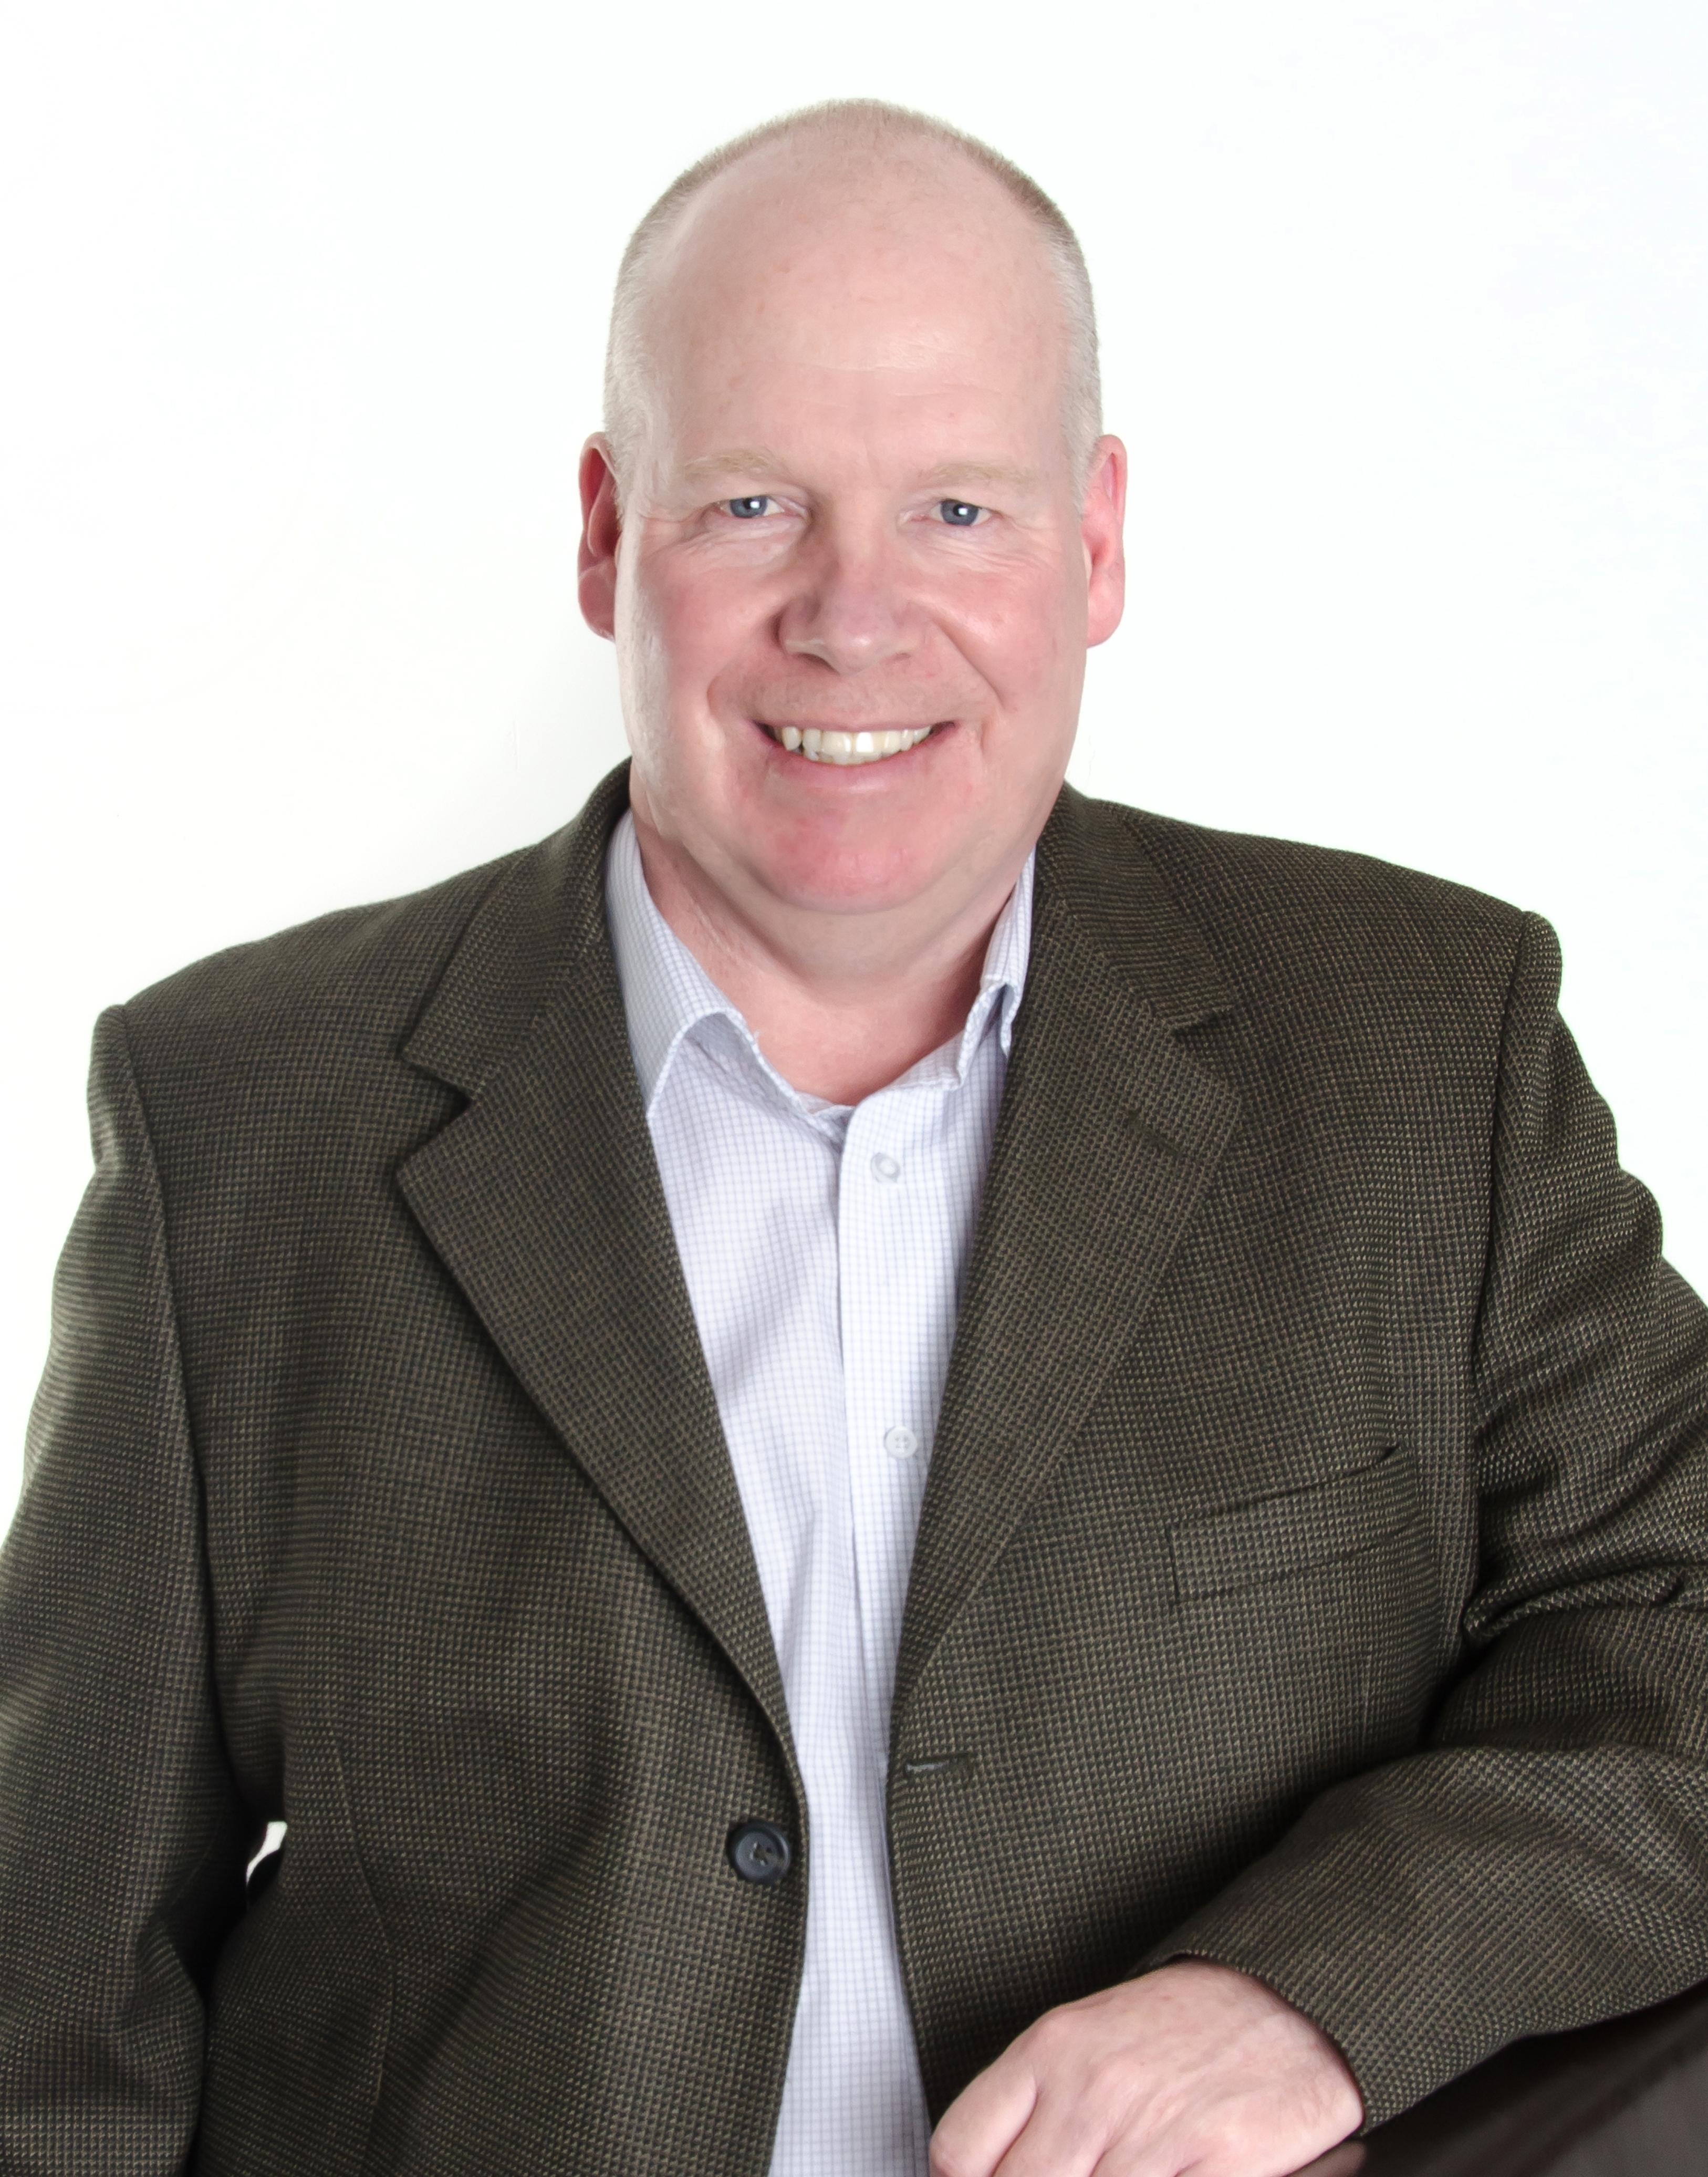 Donald MacMillan